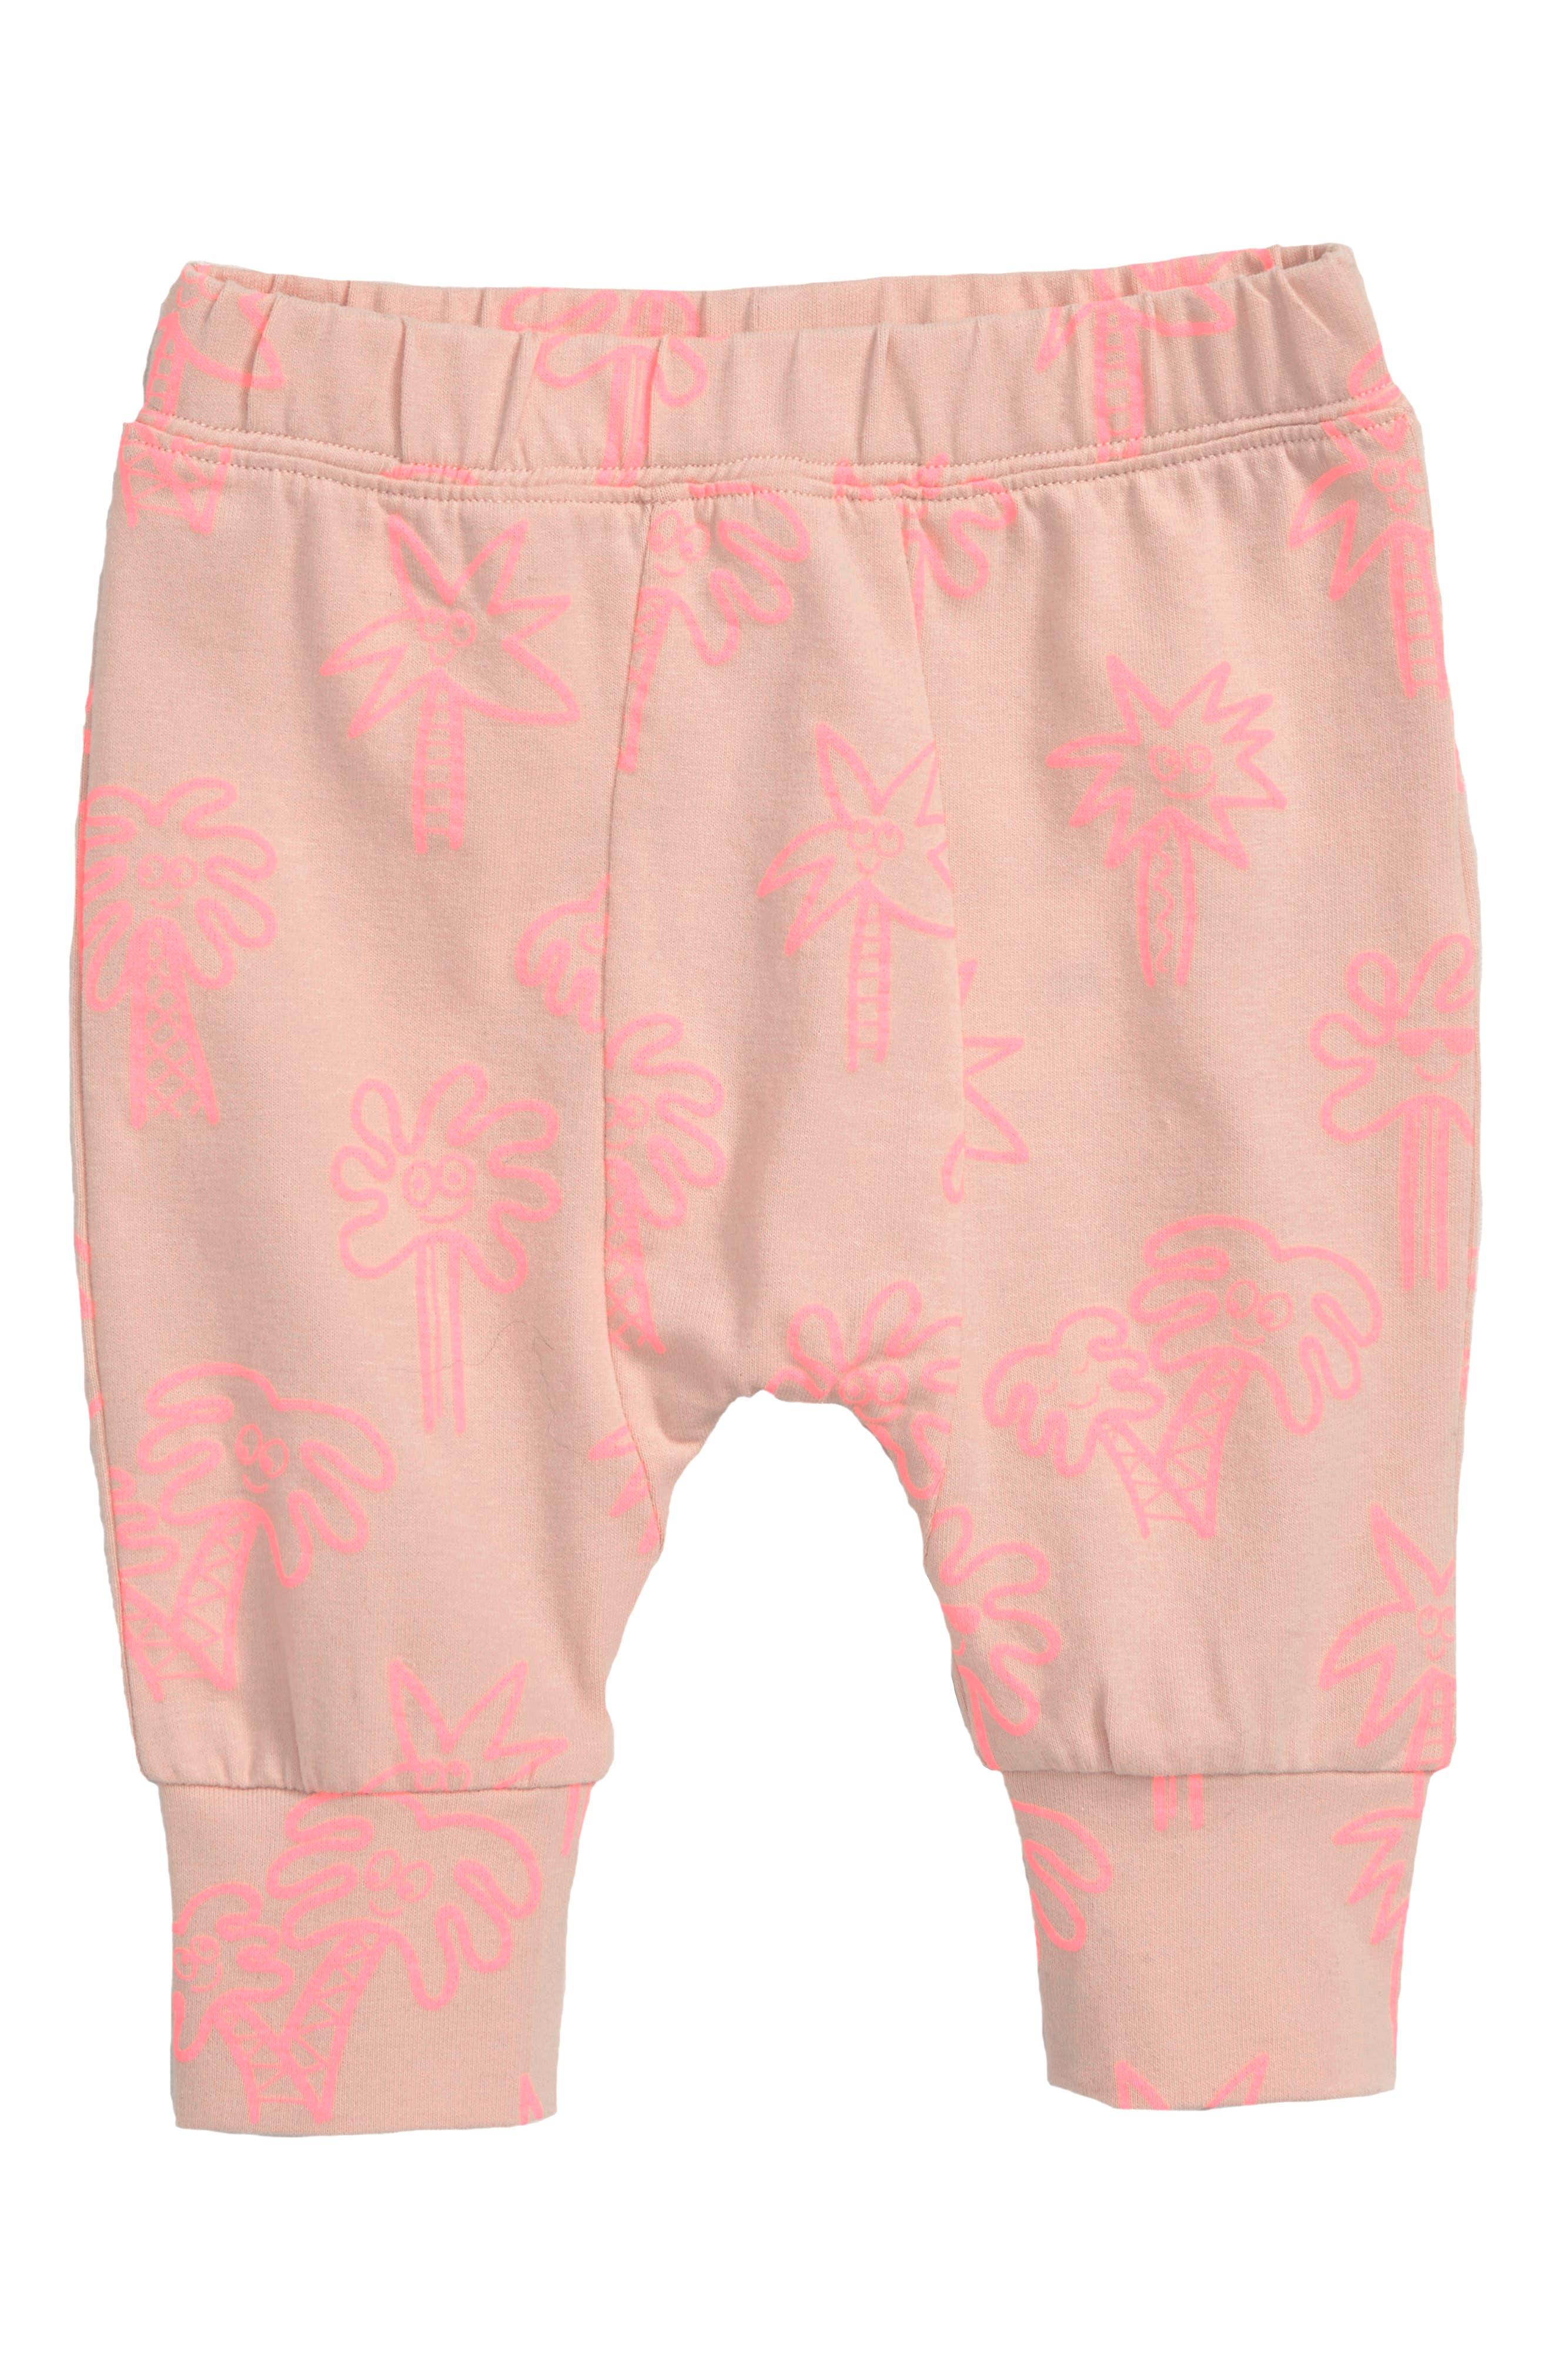 Girls Stella Mccartney Palms Jogger Pants